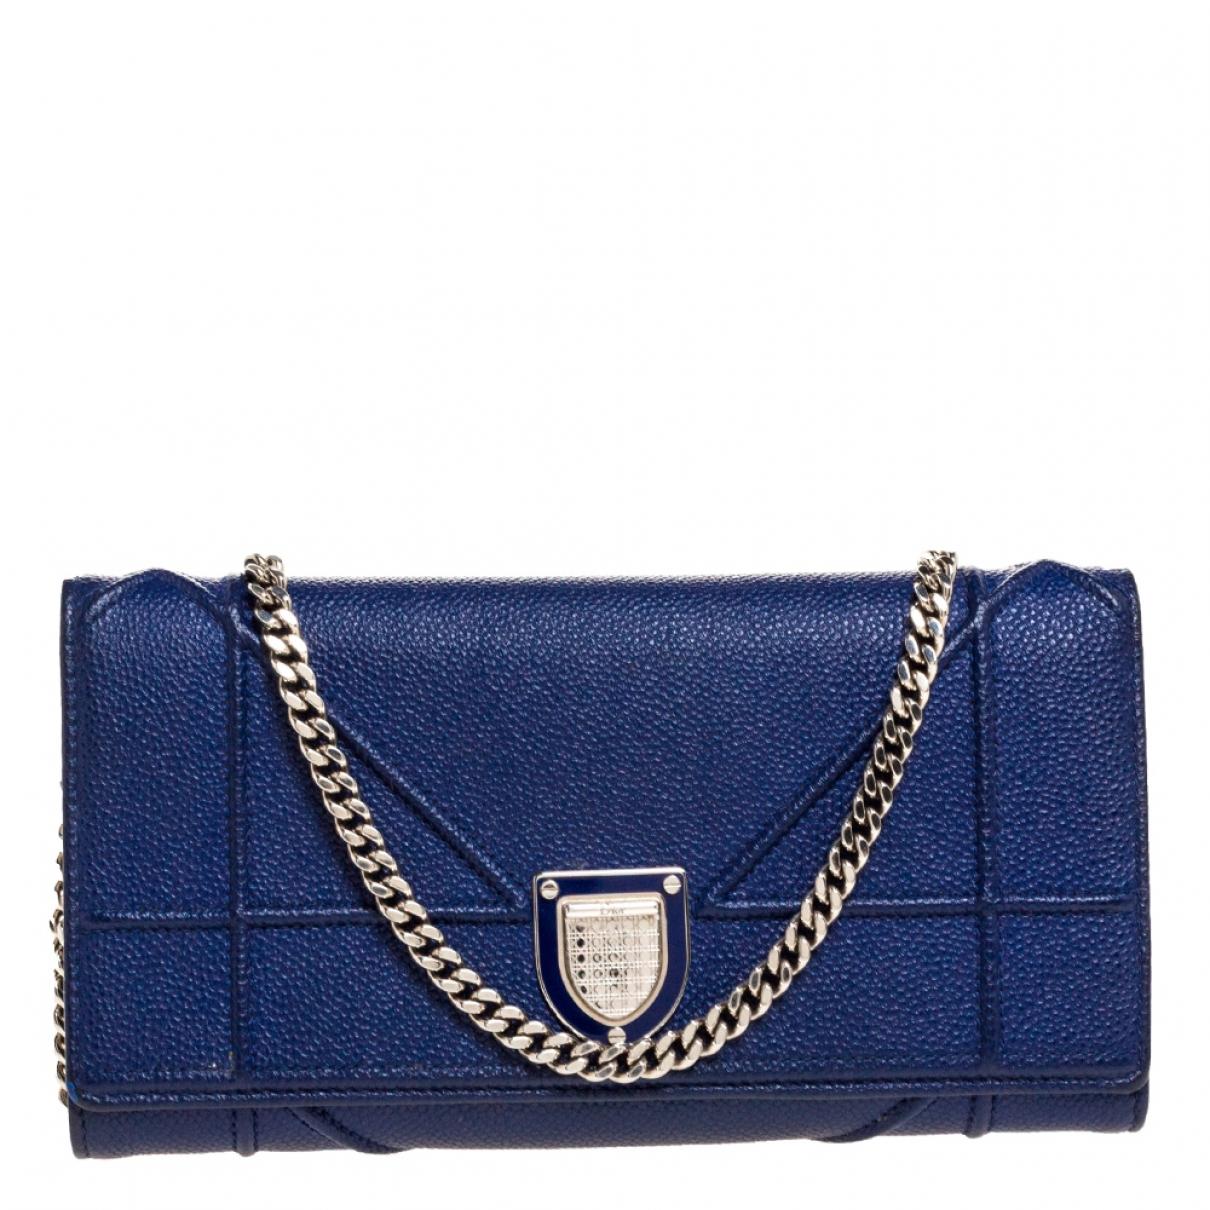 Dior - Portefeuille Diorama pour femme en cuir - bleu